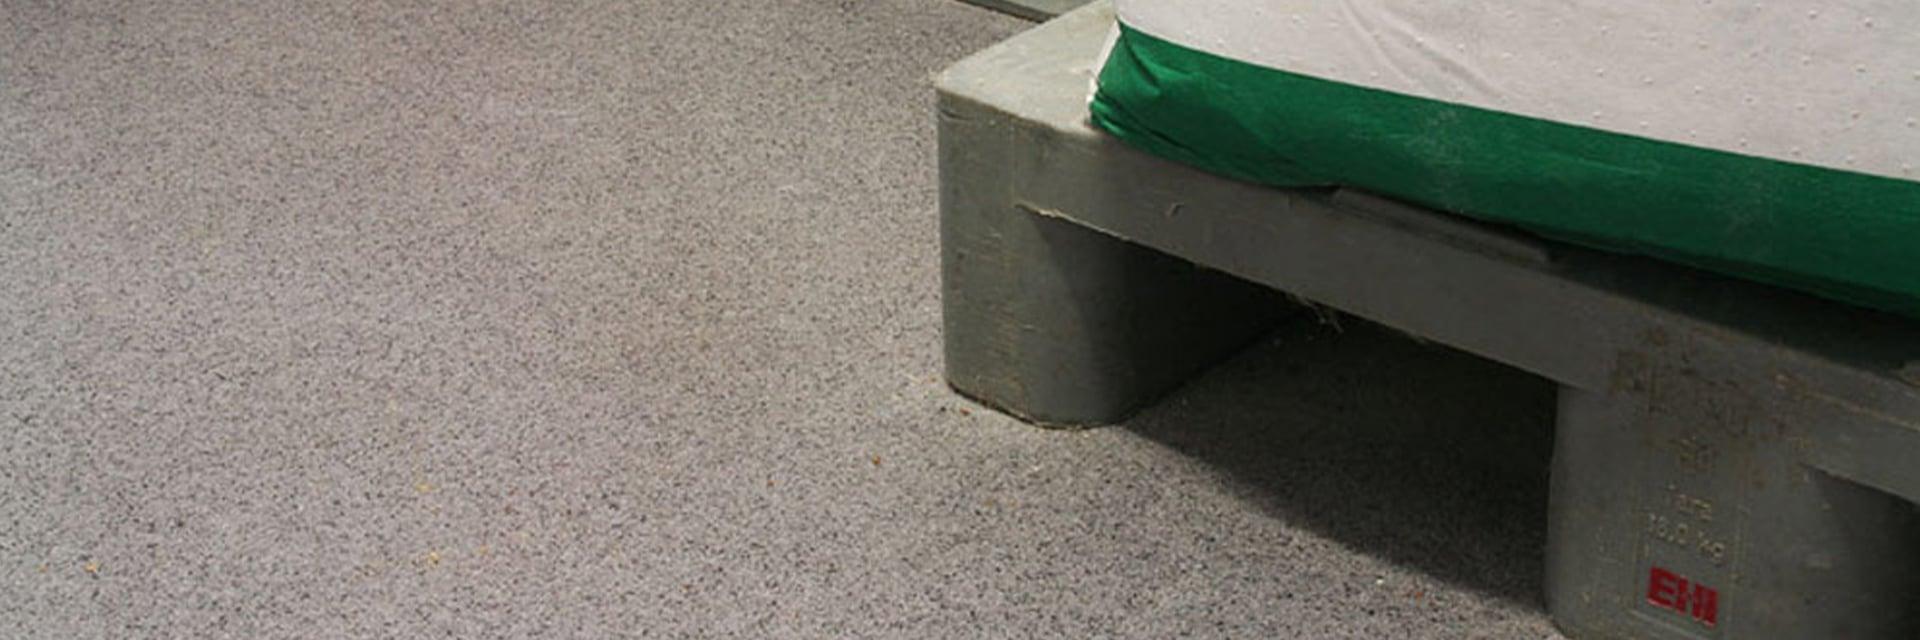 De troffelvloer als antislipvloer